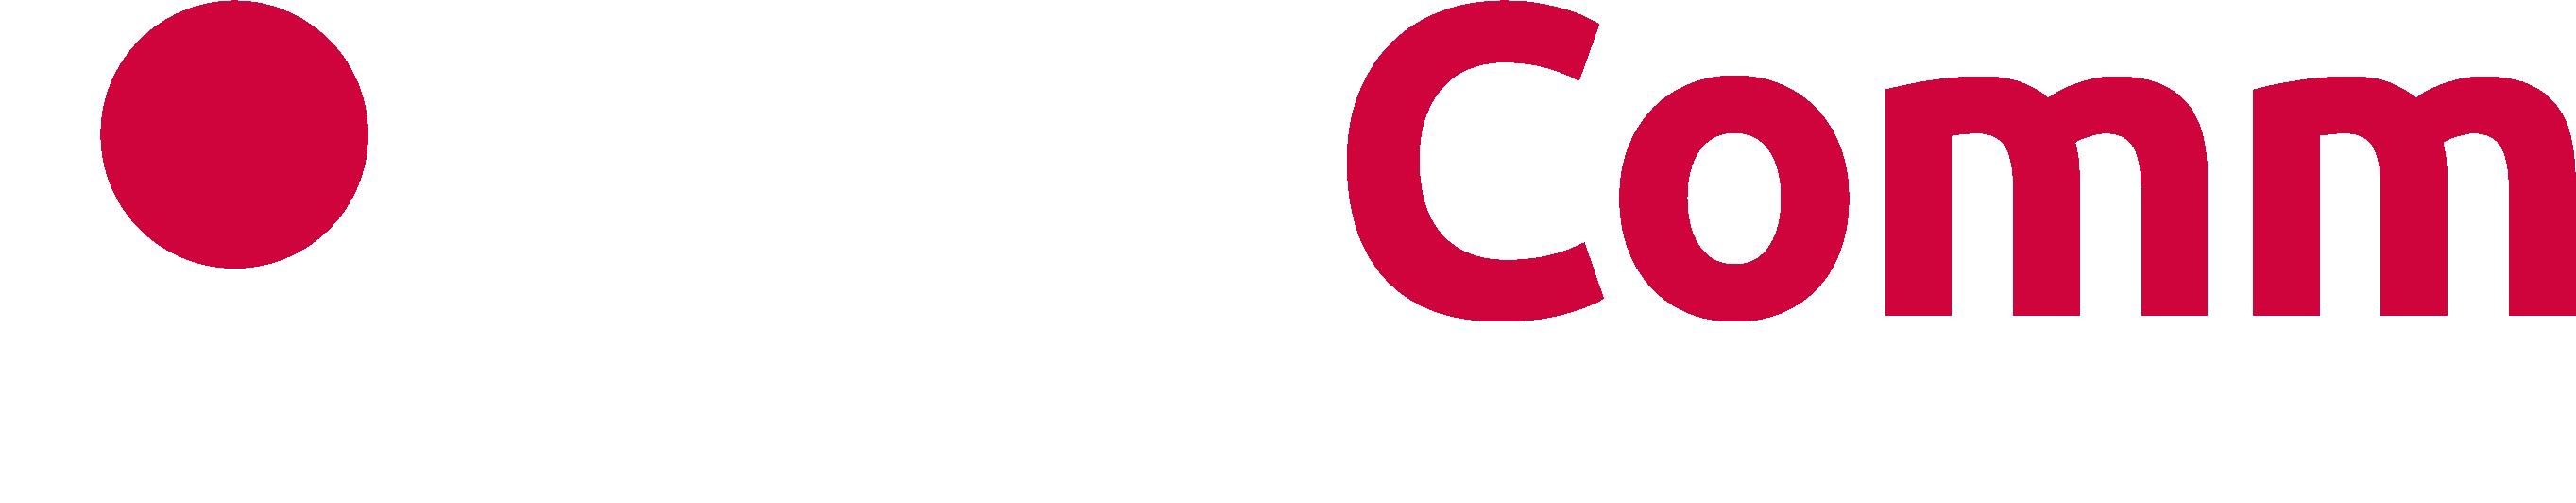 IterComm